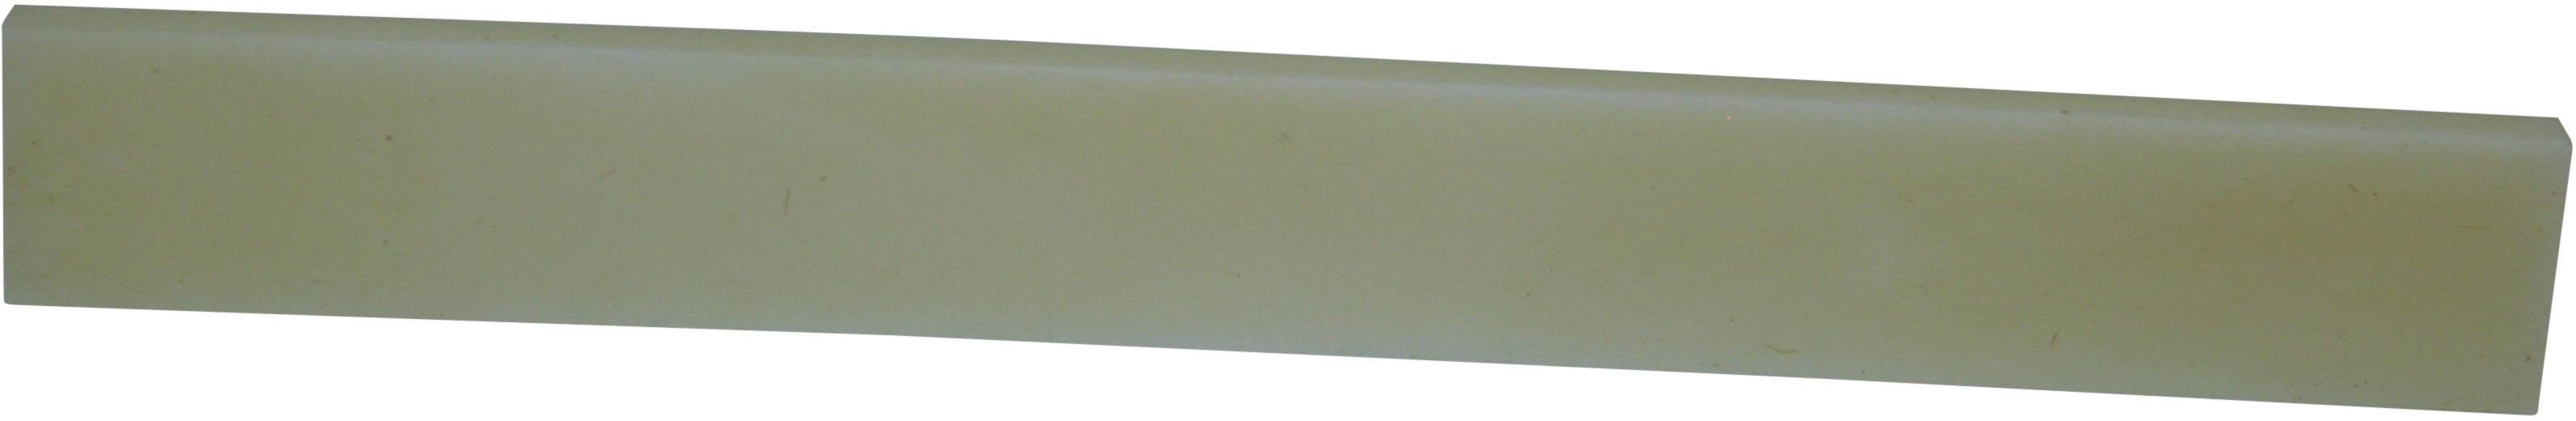 Toronzo Bone Saddle T-Blank-IV